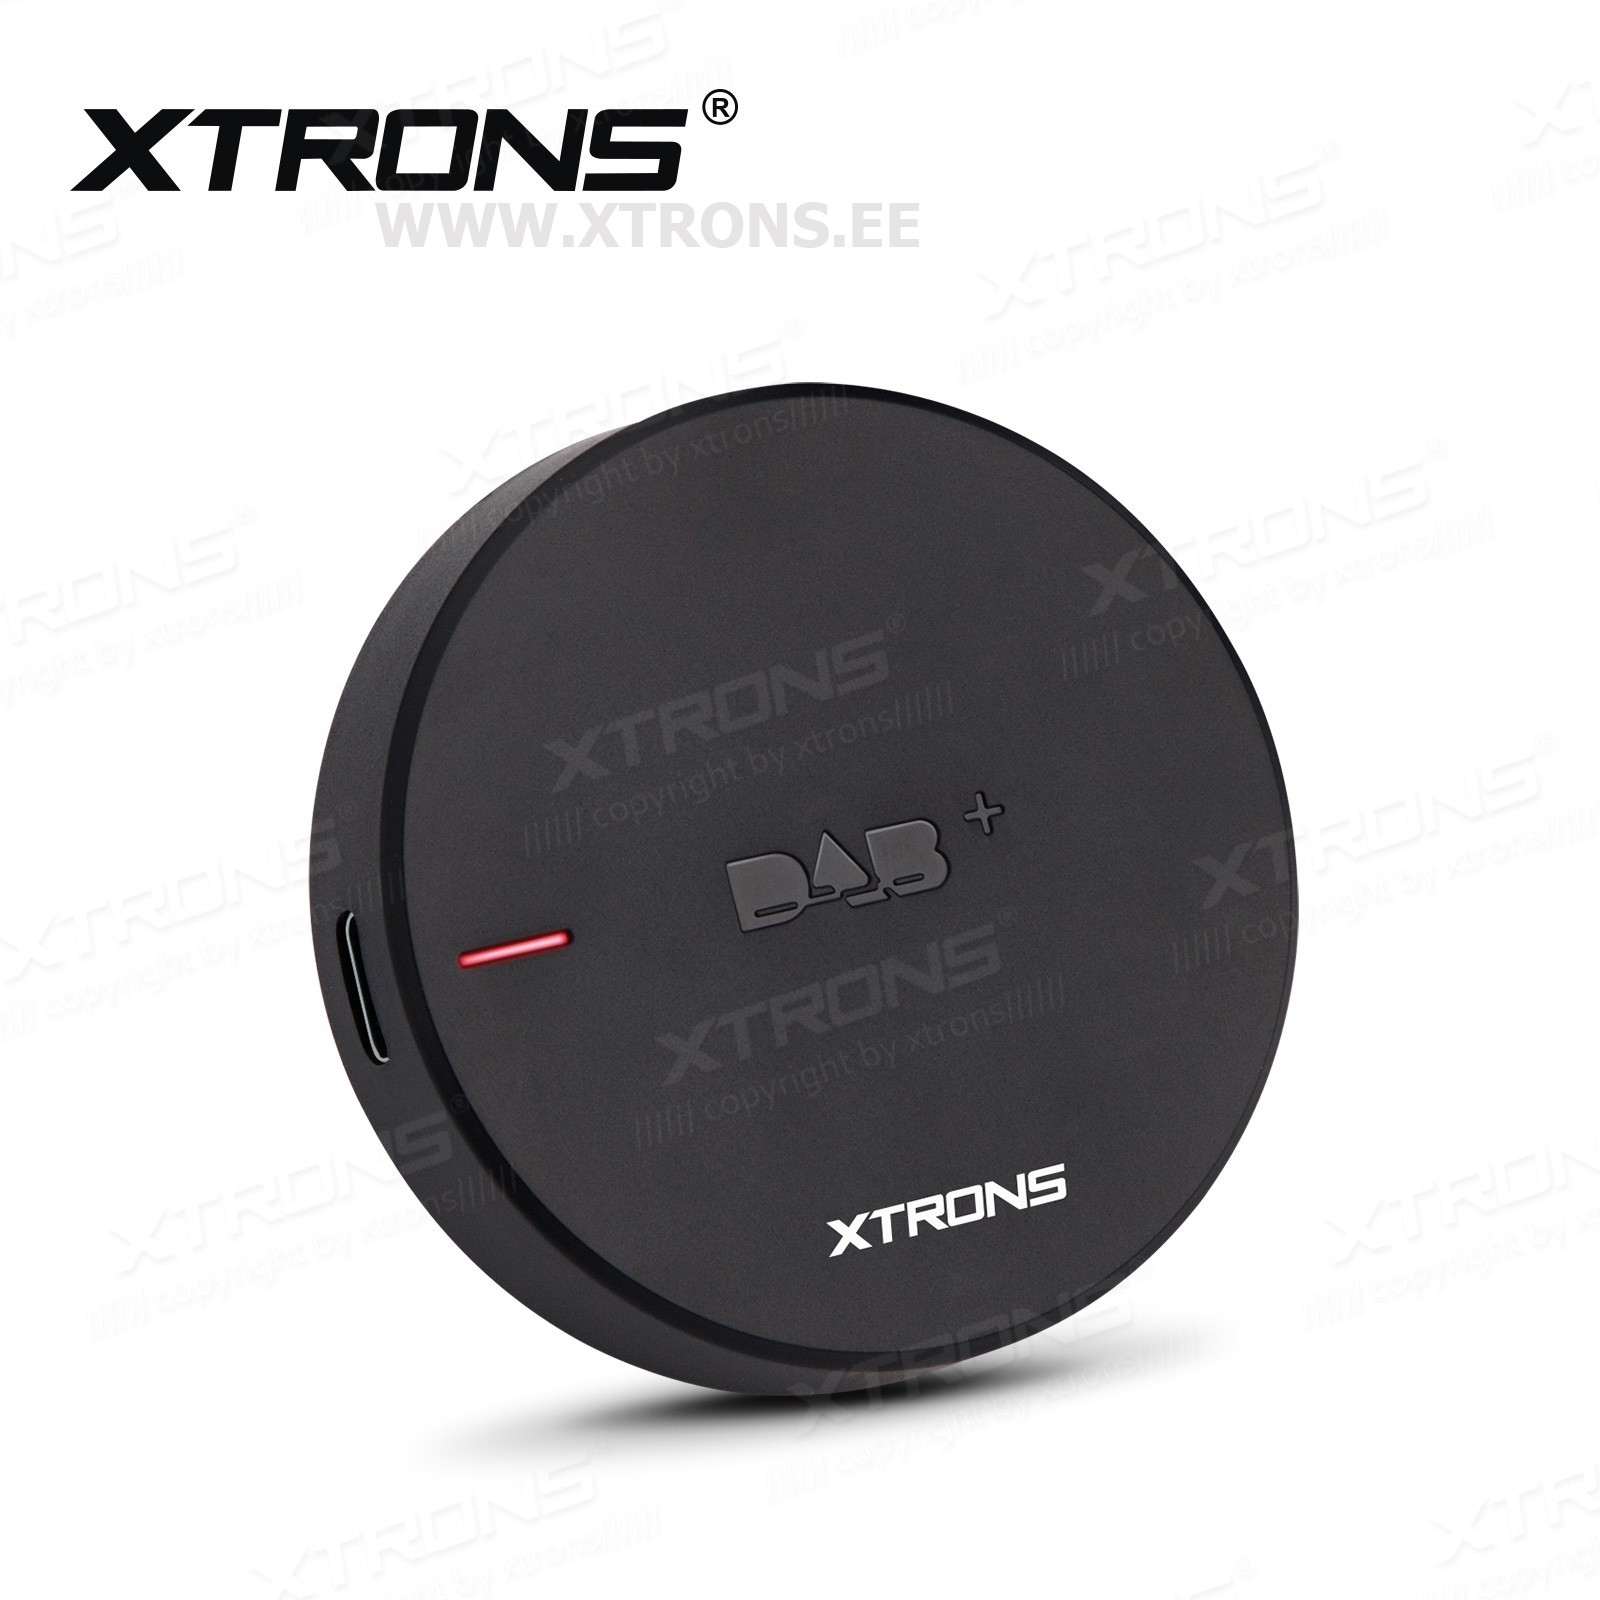 XTRONS USBDAB03